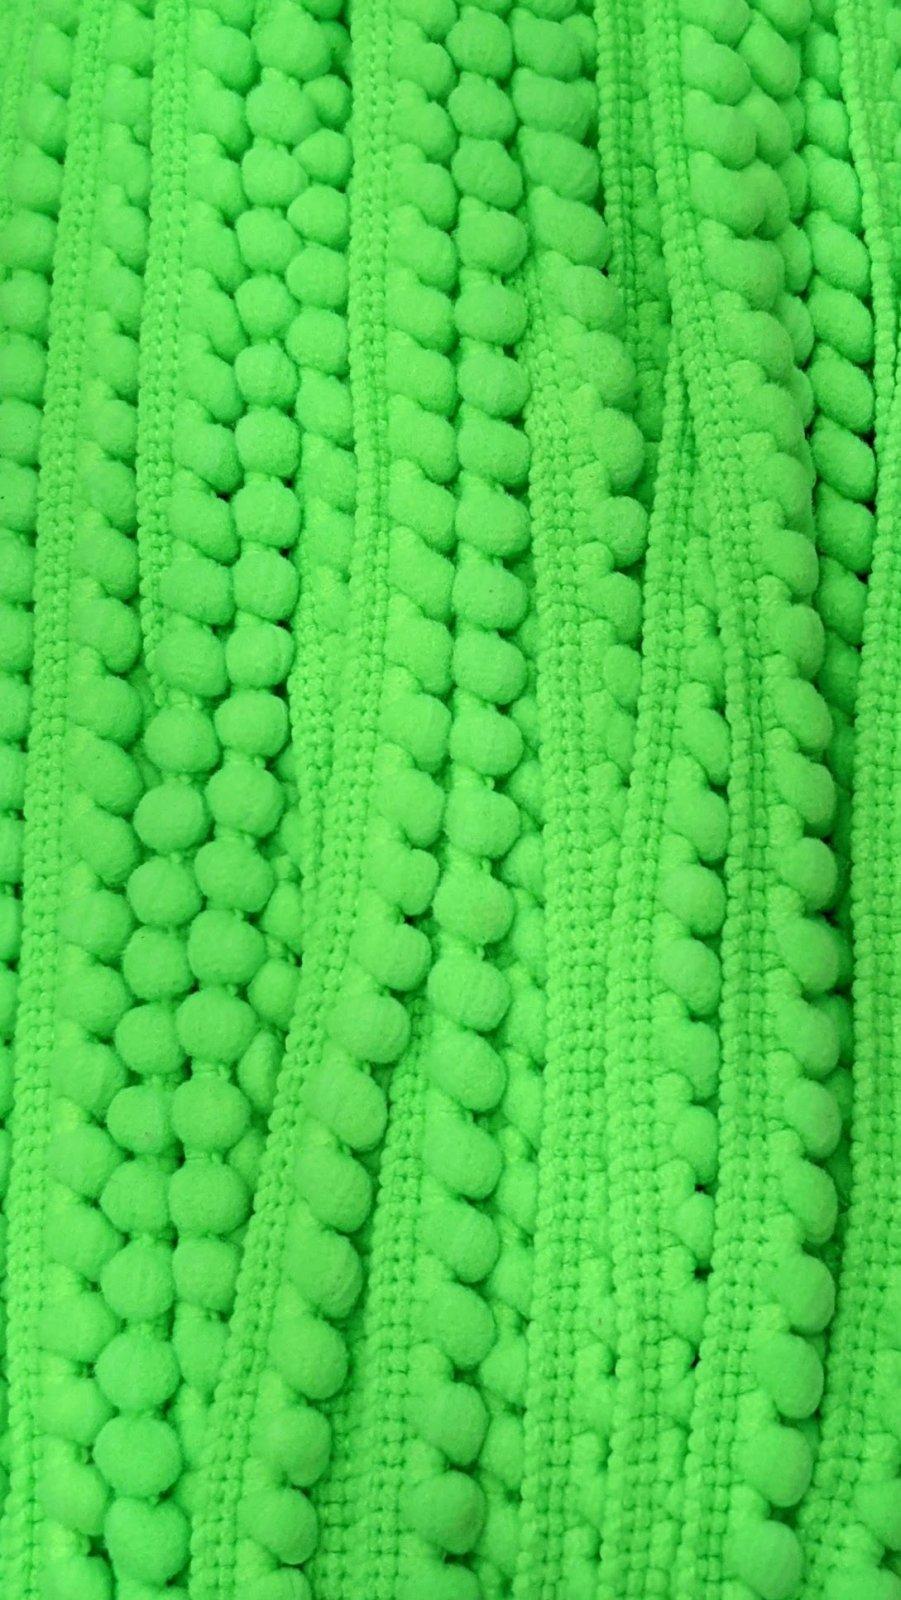 Mini Pom Pom Trim 3/8 - Lime Green